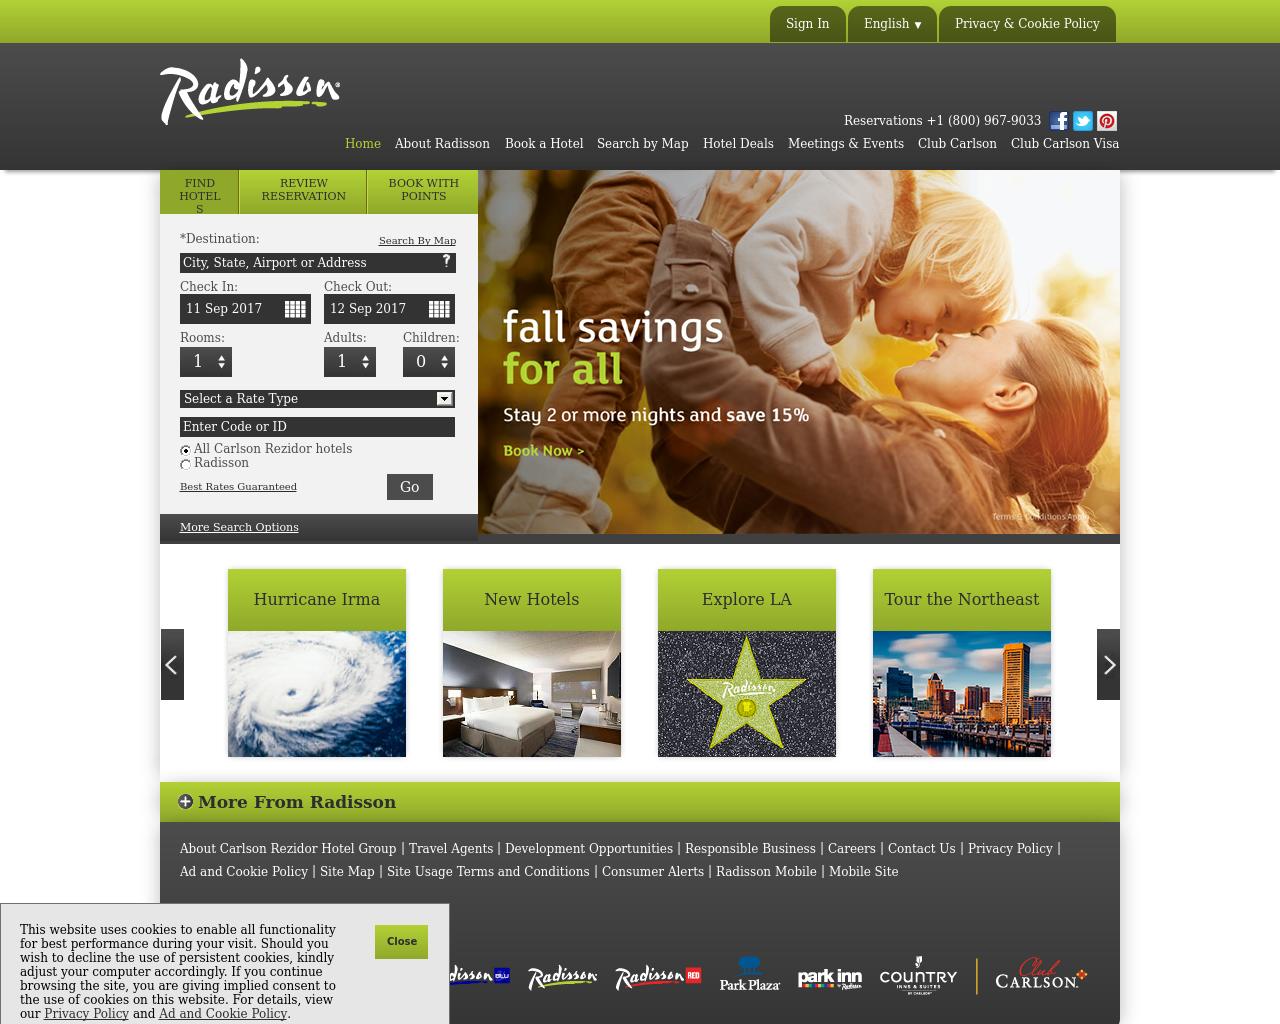 Radisson-Advertising-Reviews-Pricing